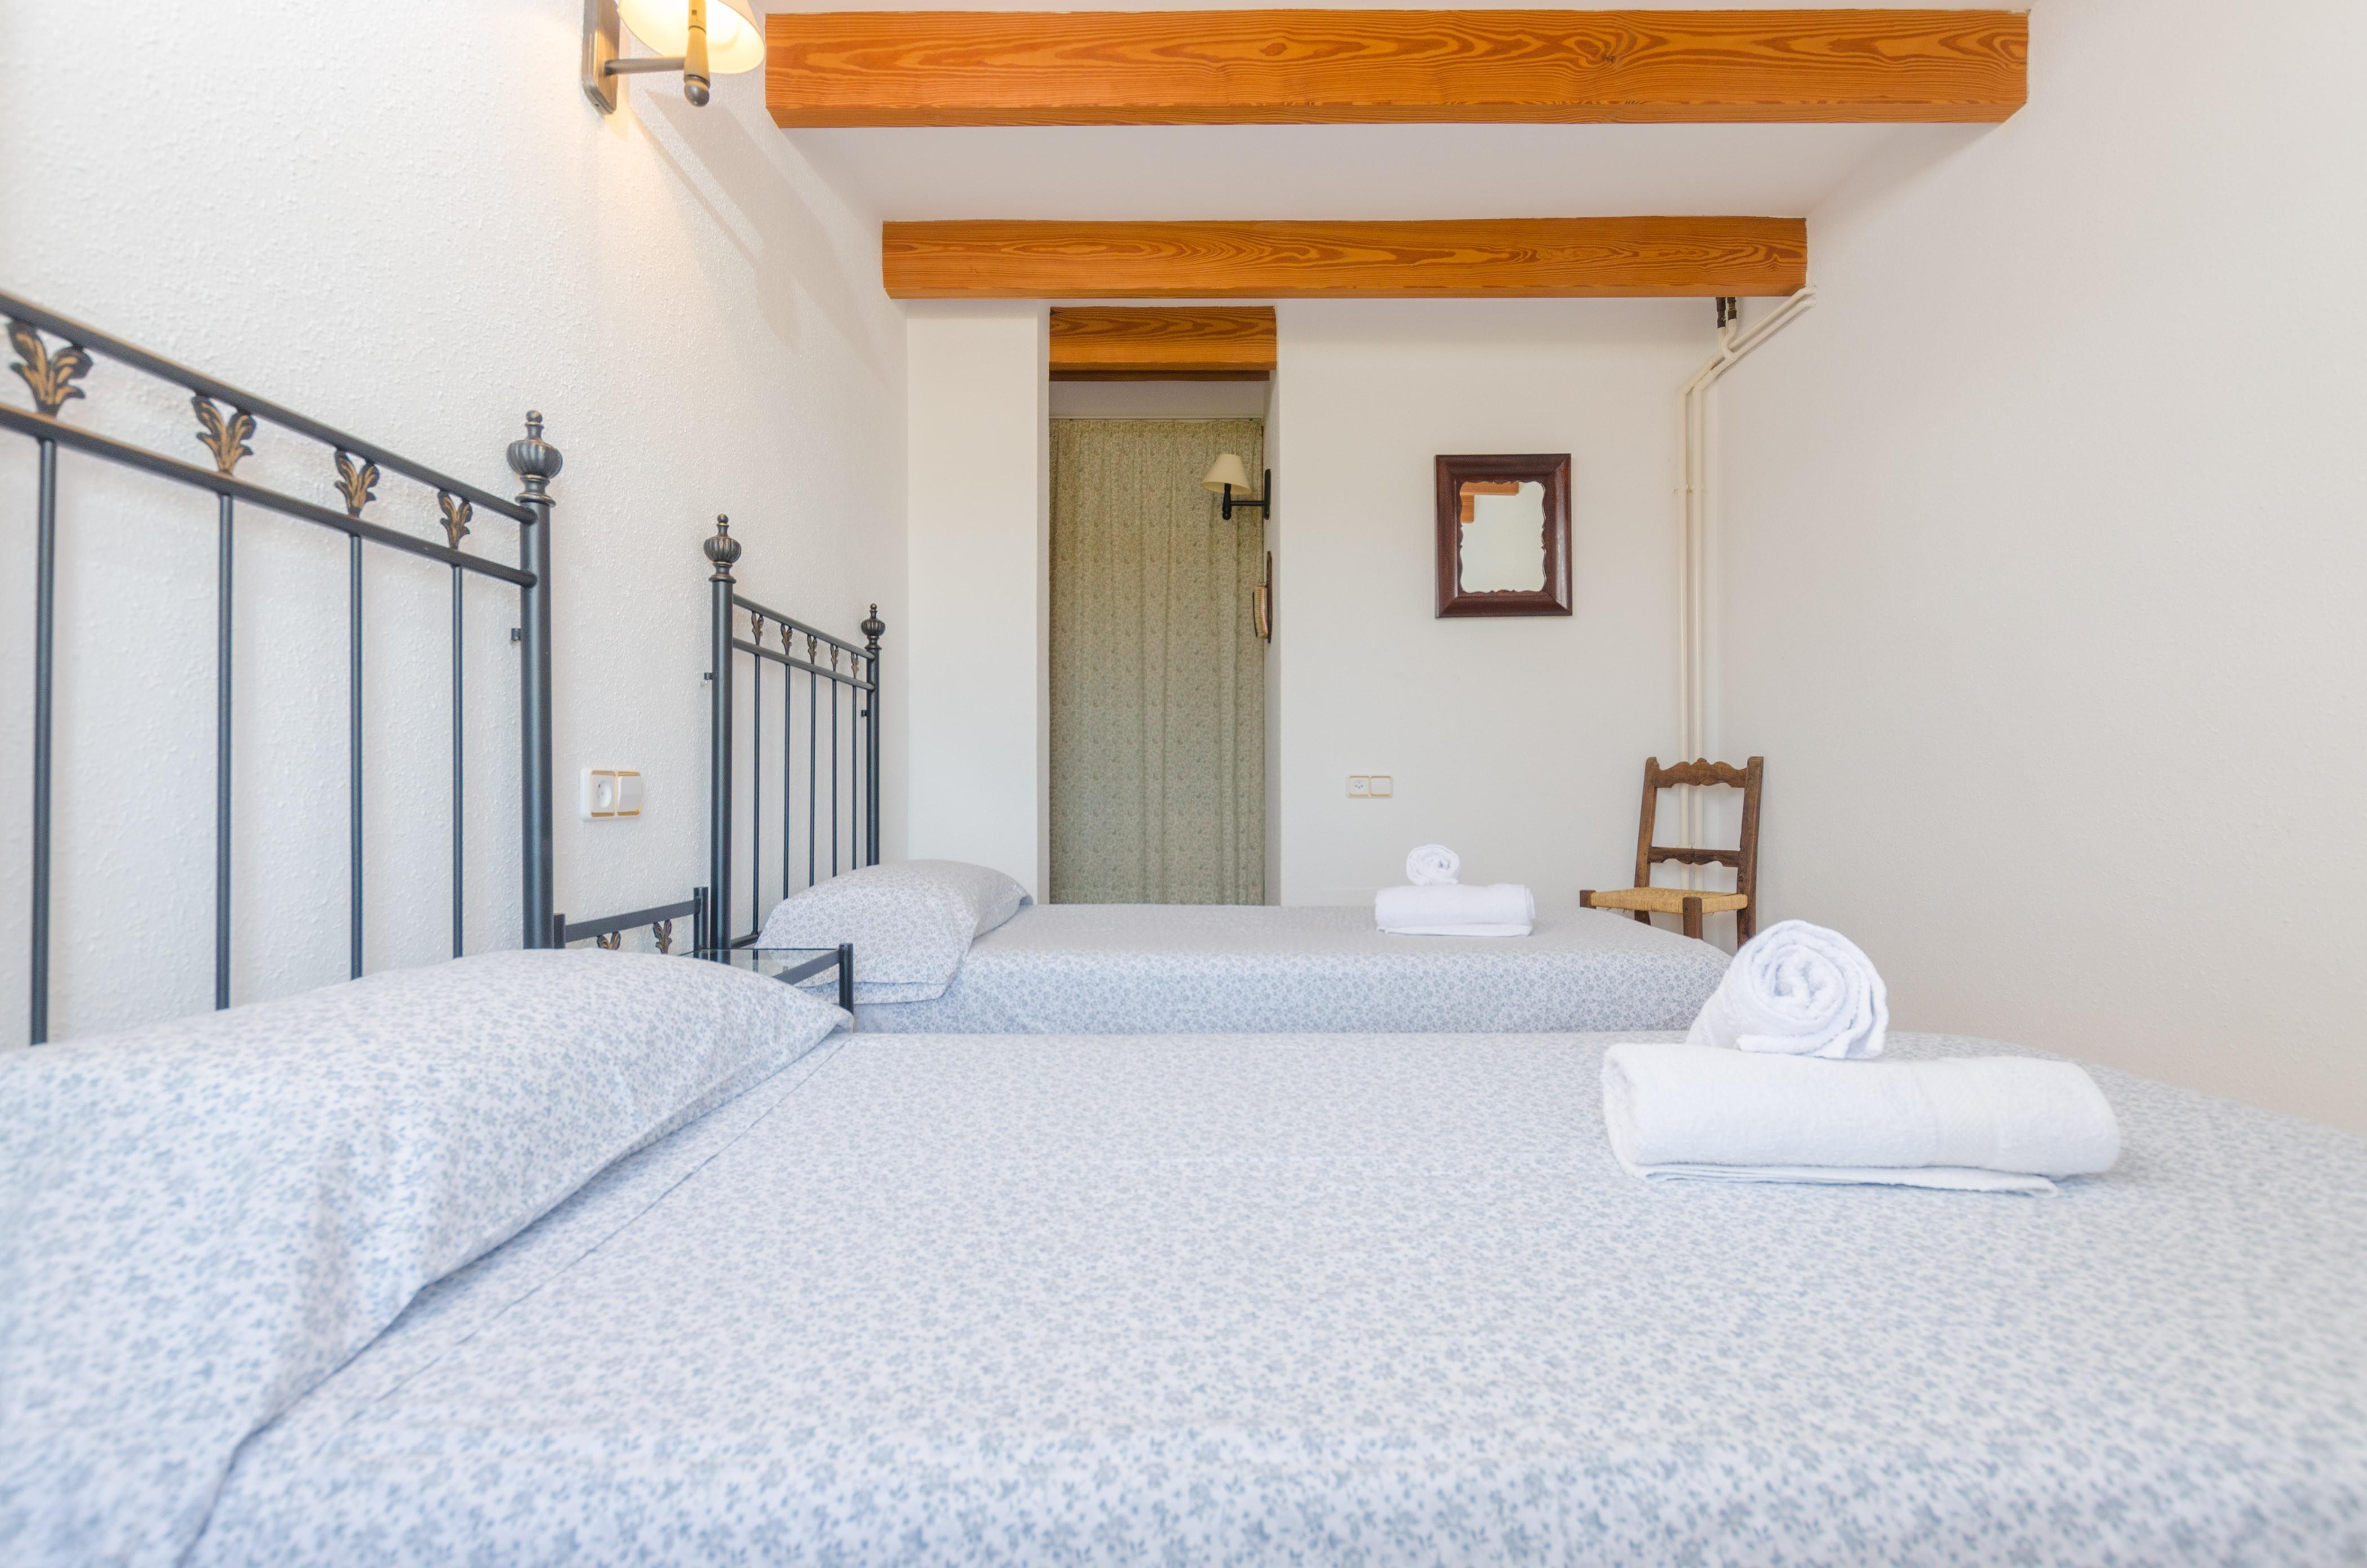 Maison de vacances SA SINIA (2374876), Lloret de Vistalegre, Majorque, Iles Baléares, Espagne, image 33